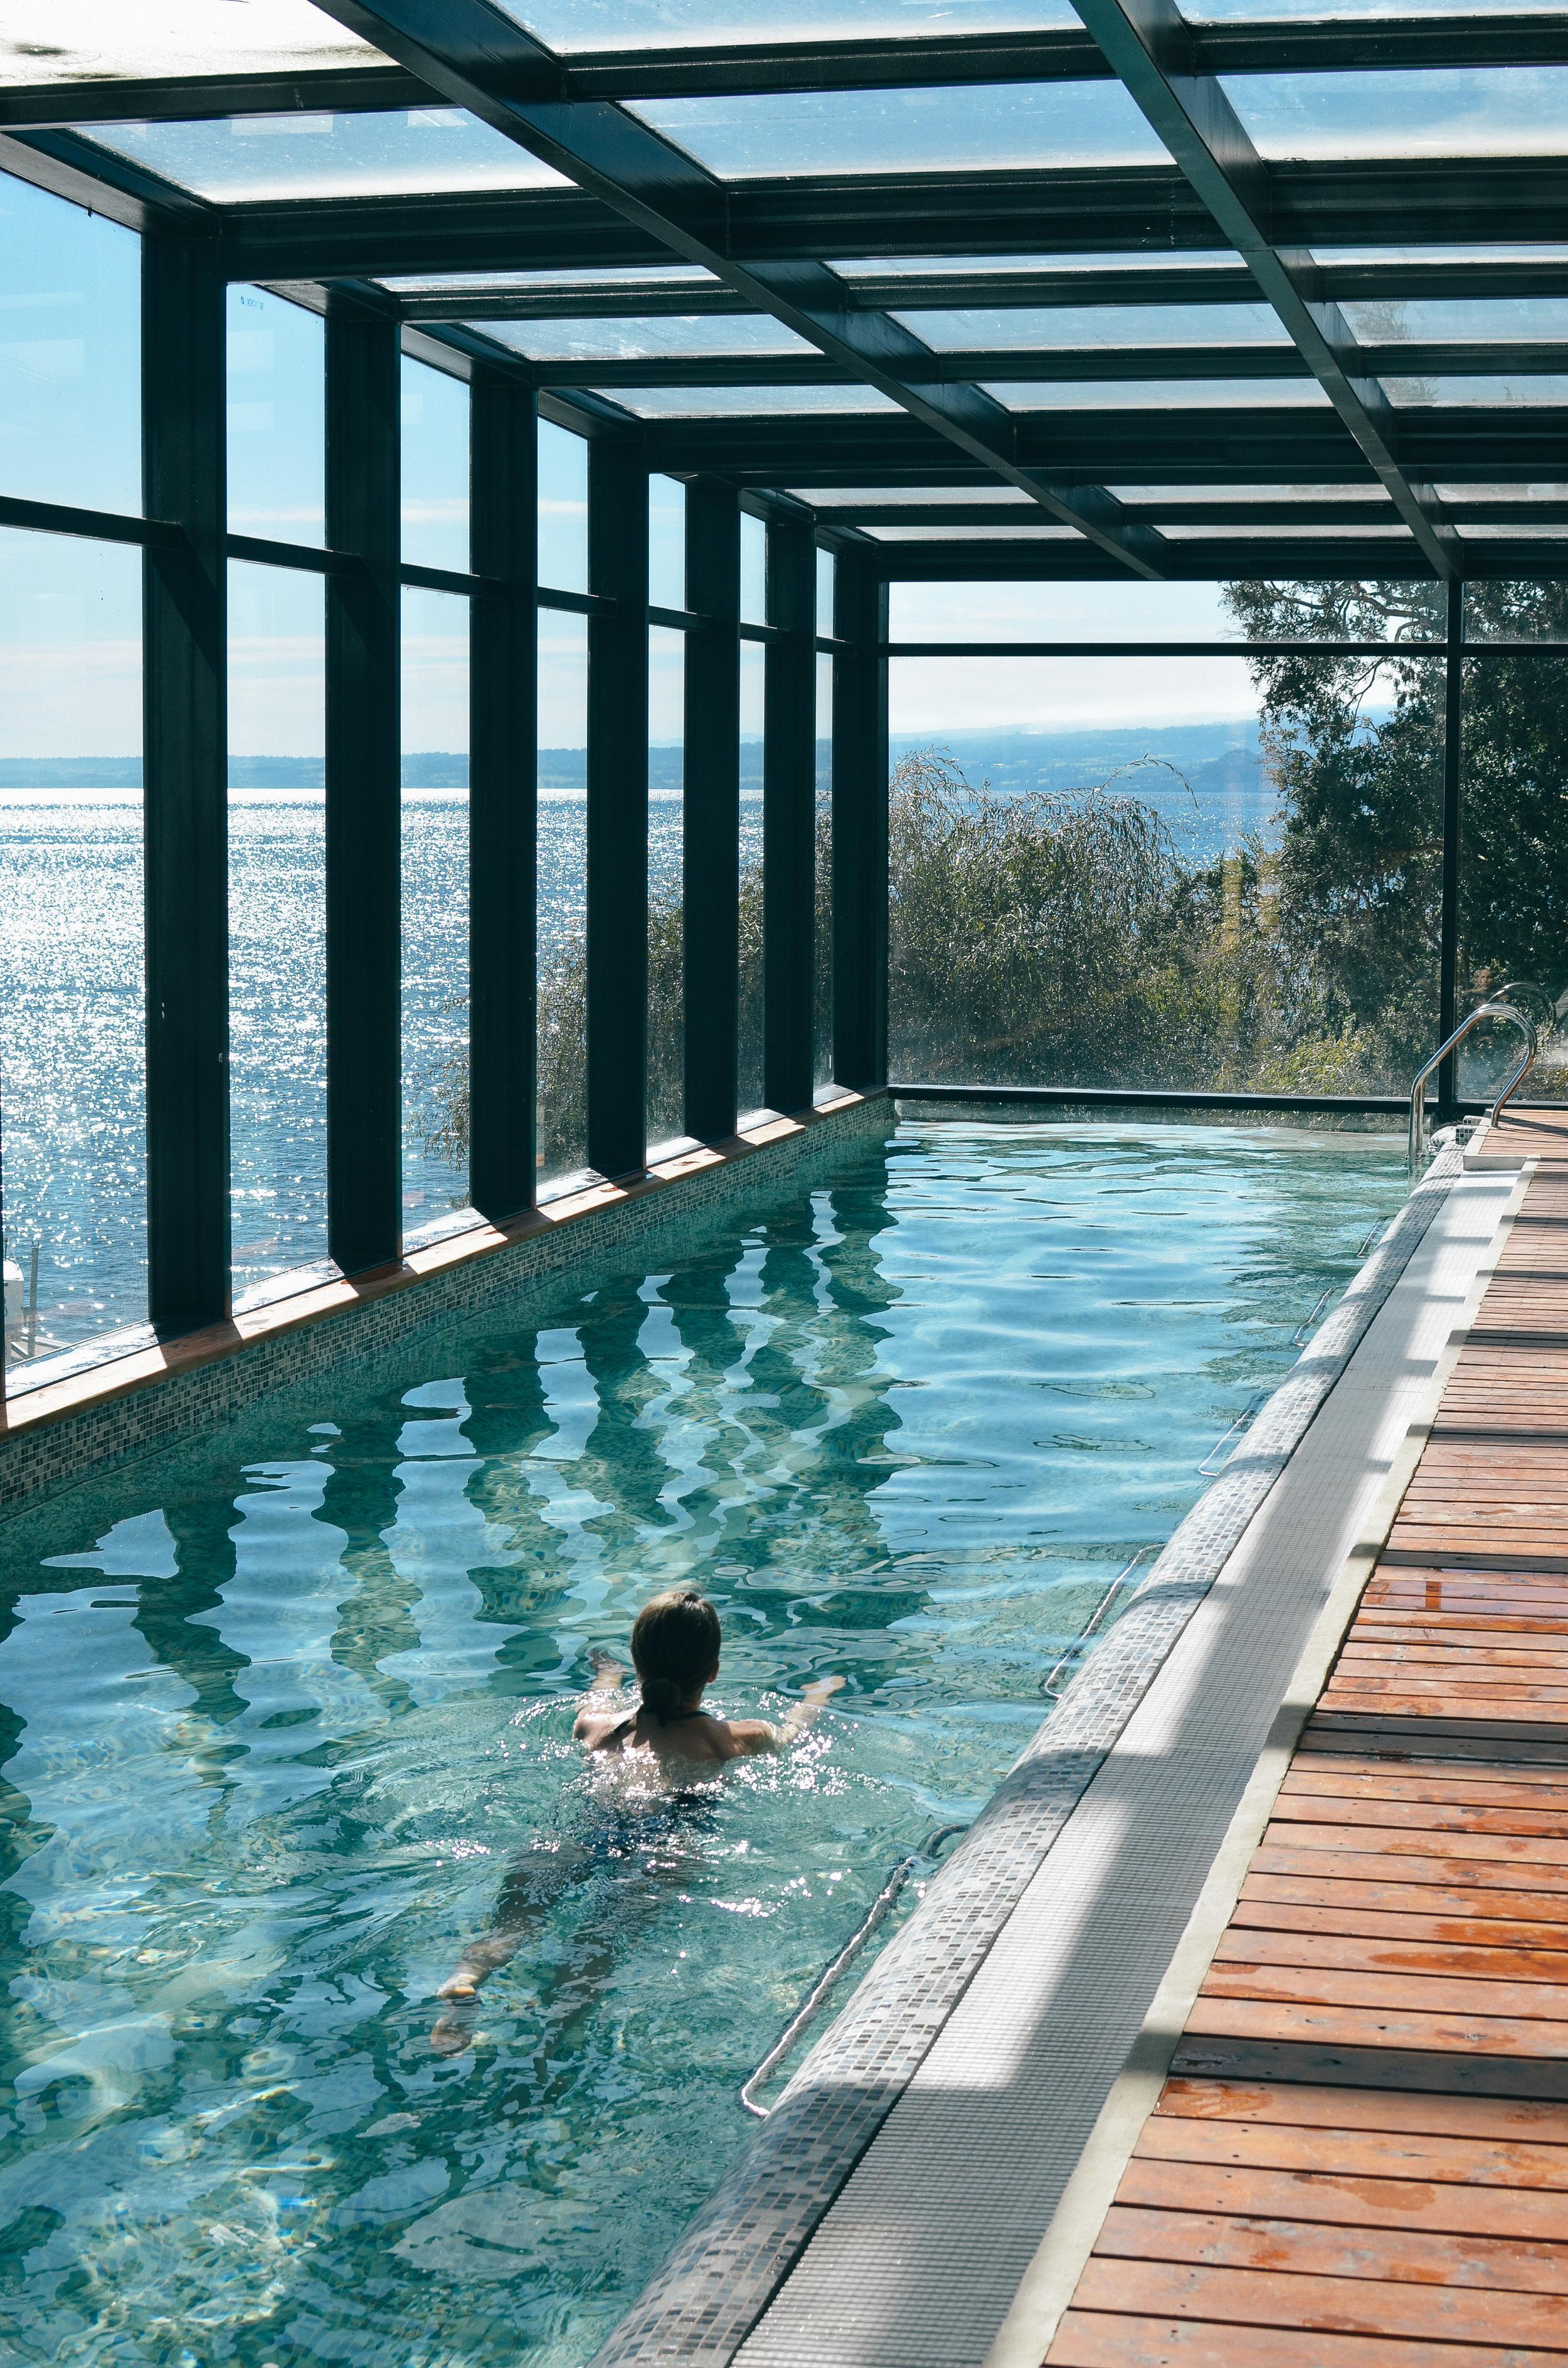 chile+awa+hotel+travel+guide+life+on+pine_DSC_1423.jpg